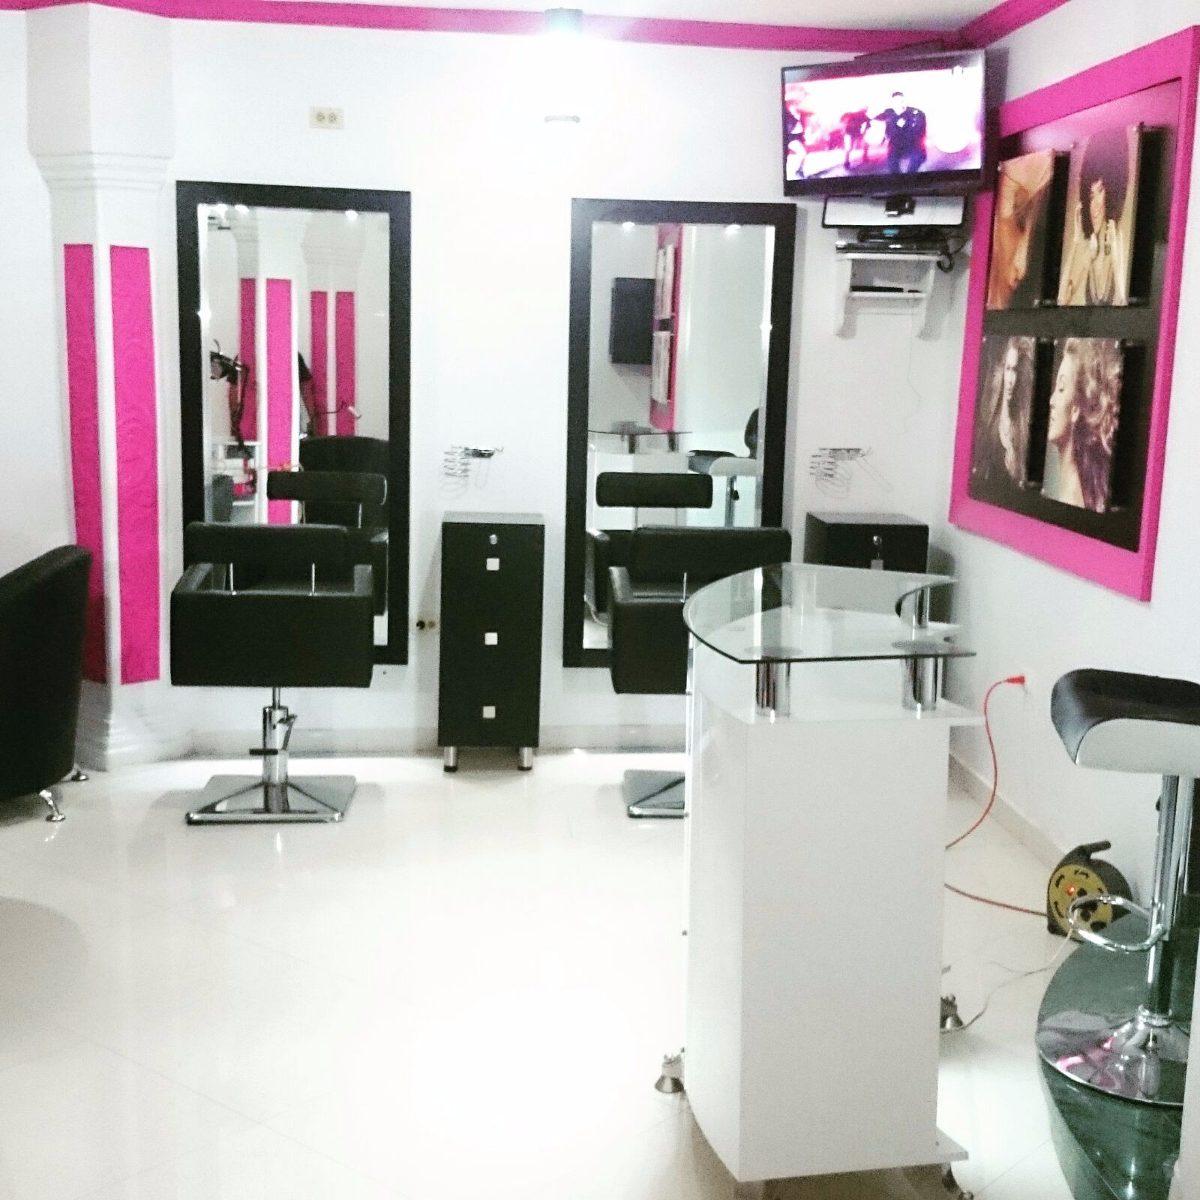 Mobiliario de peluquer as peinadoras entamboradas bs 2 for Salones de peluqueria decoracion fotos